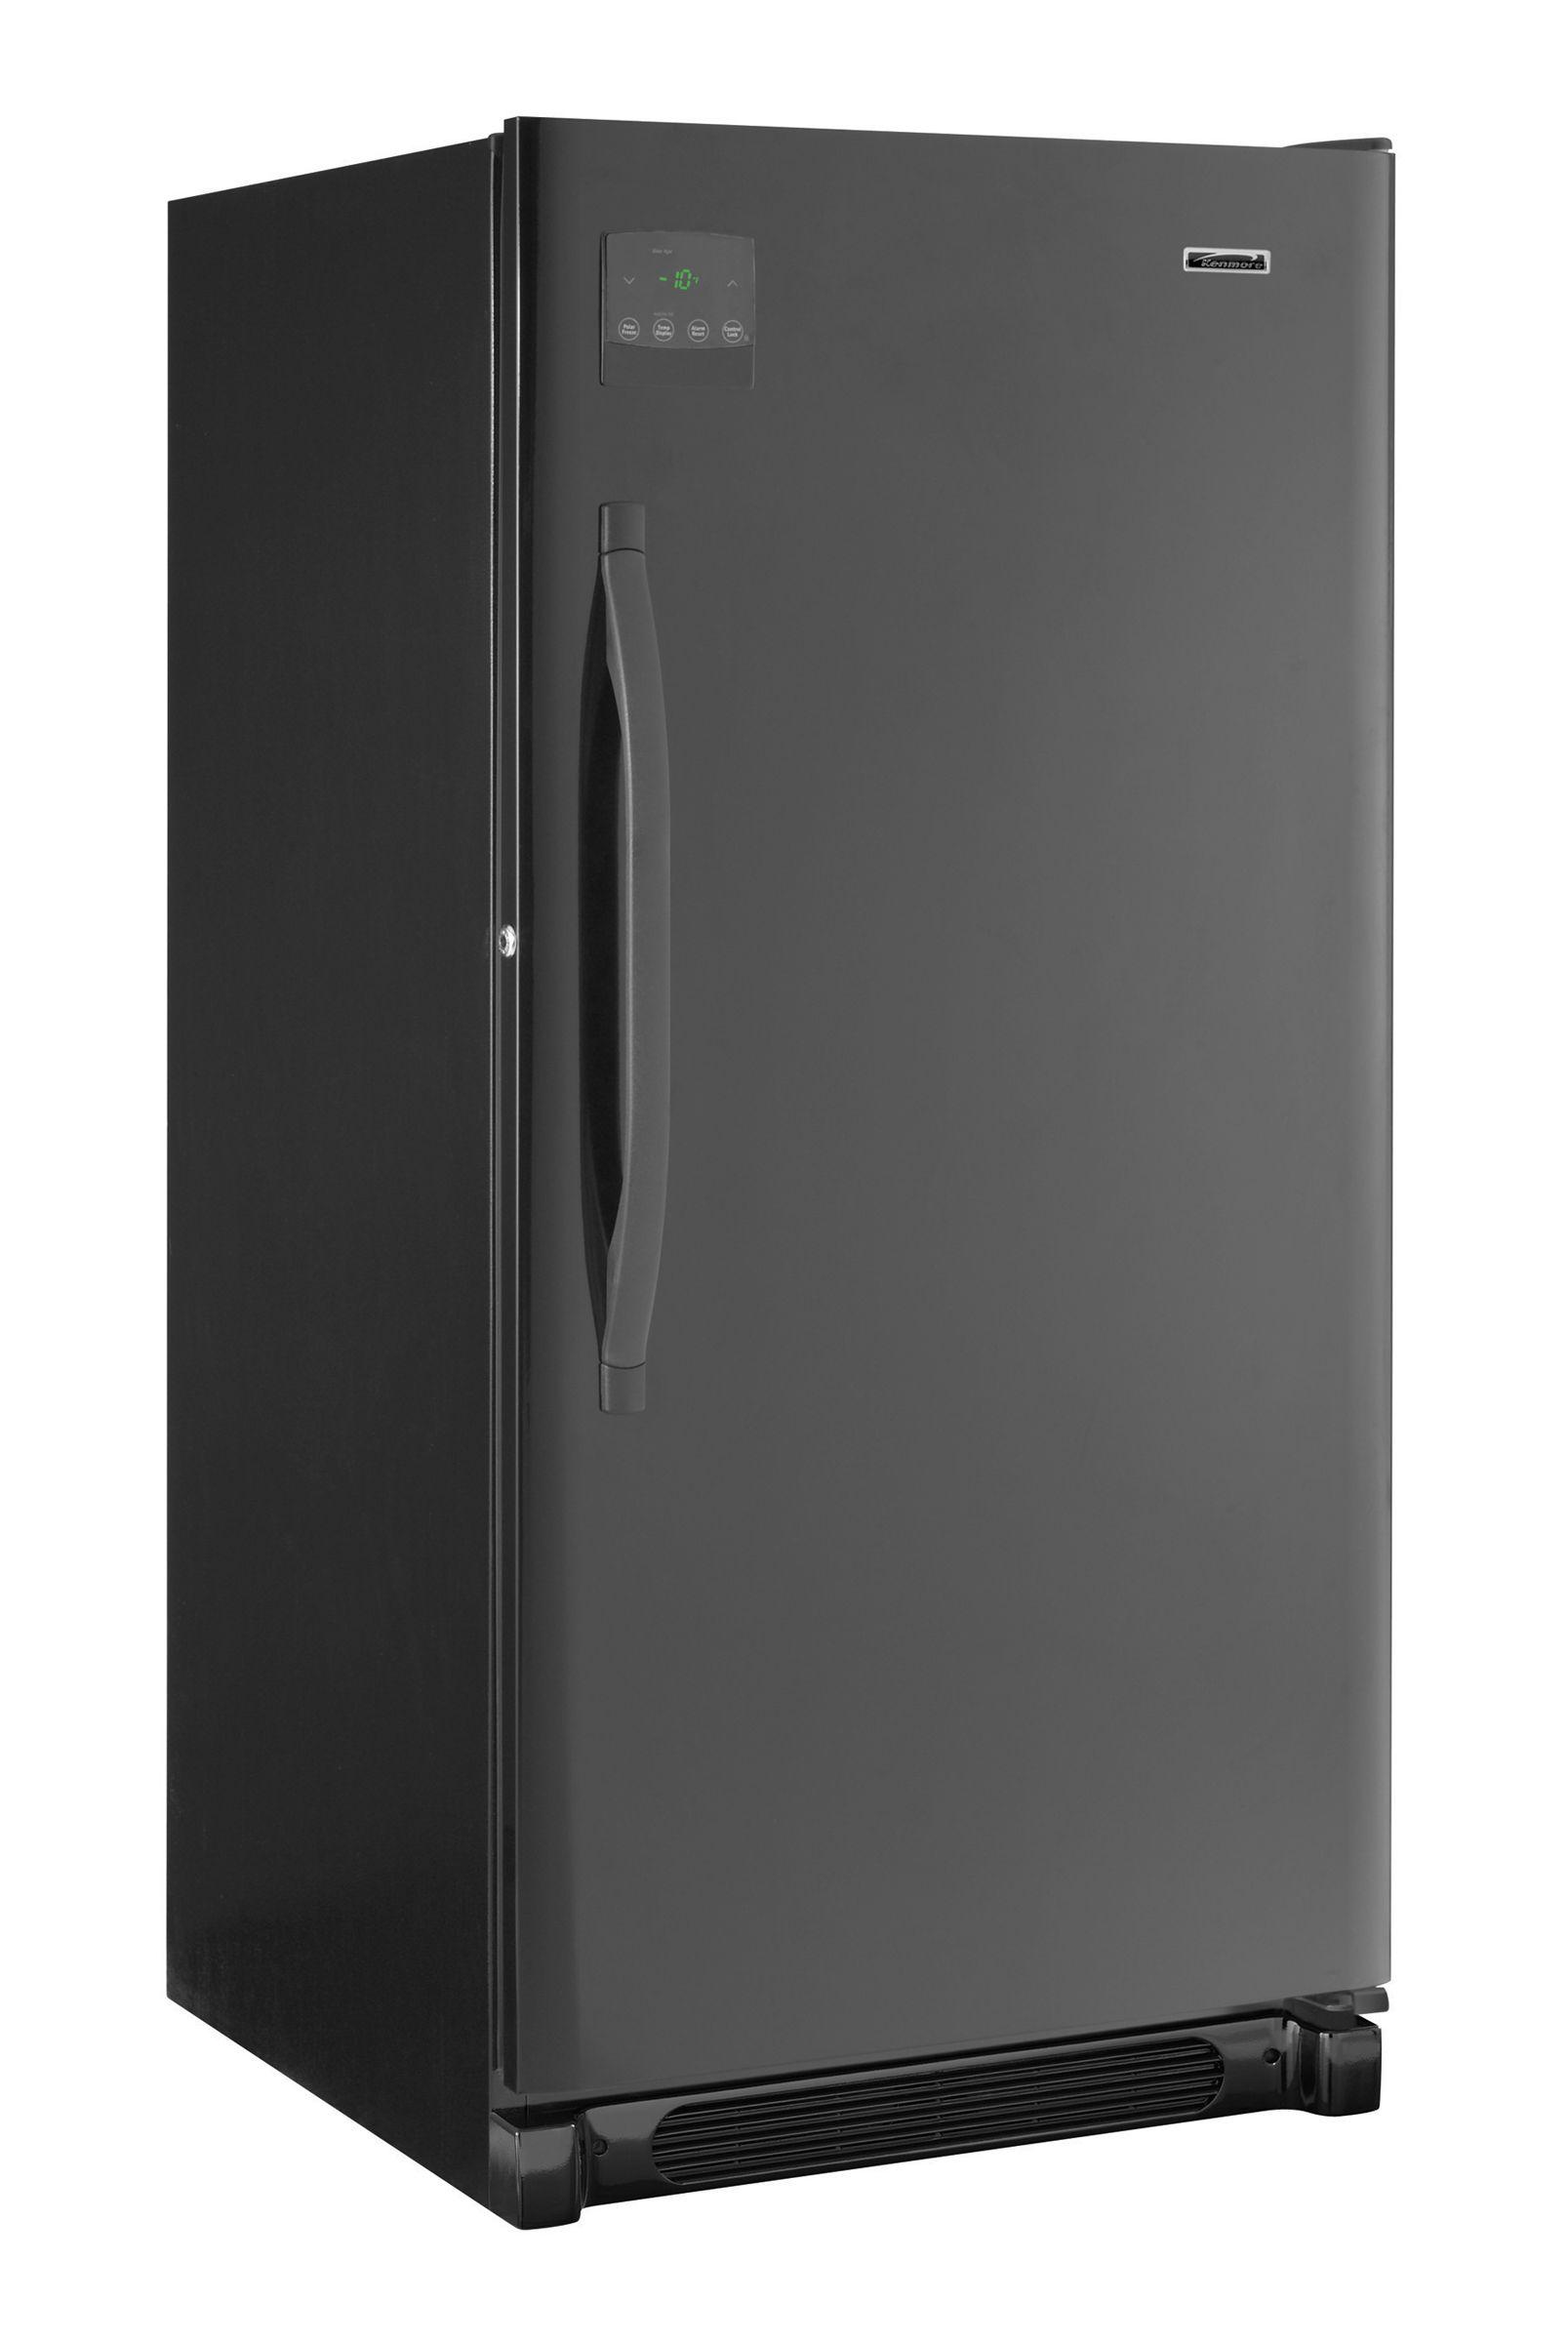 Kenmore 13.7 cu. ft. Upright Freezer (Model 2845)